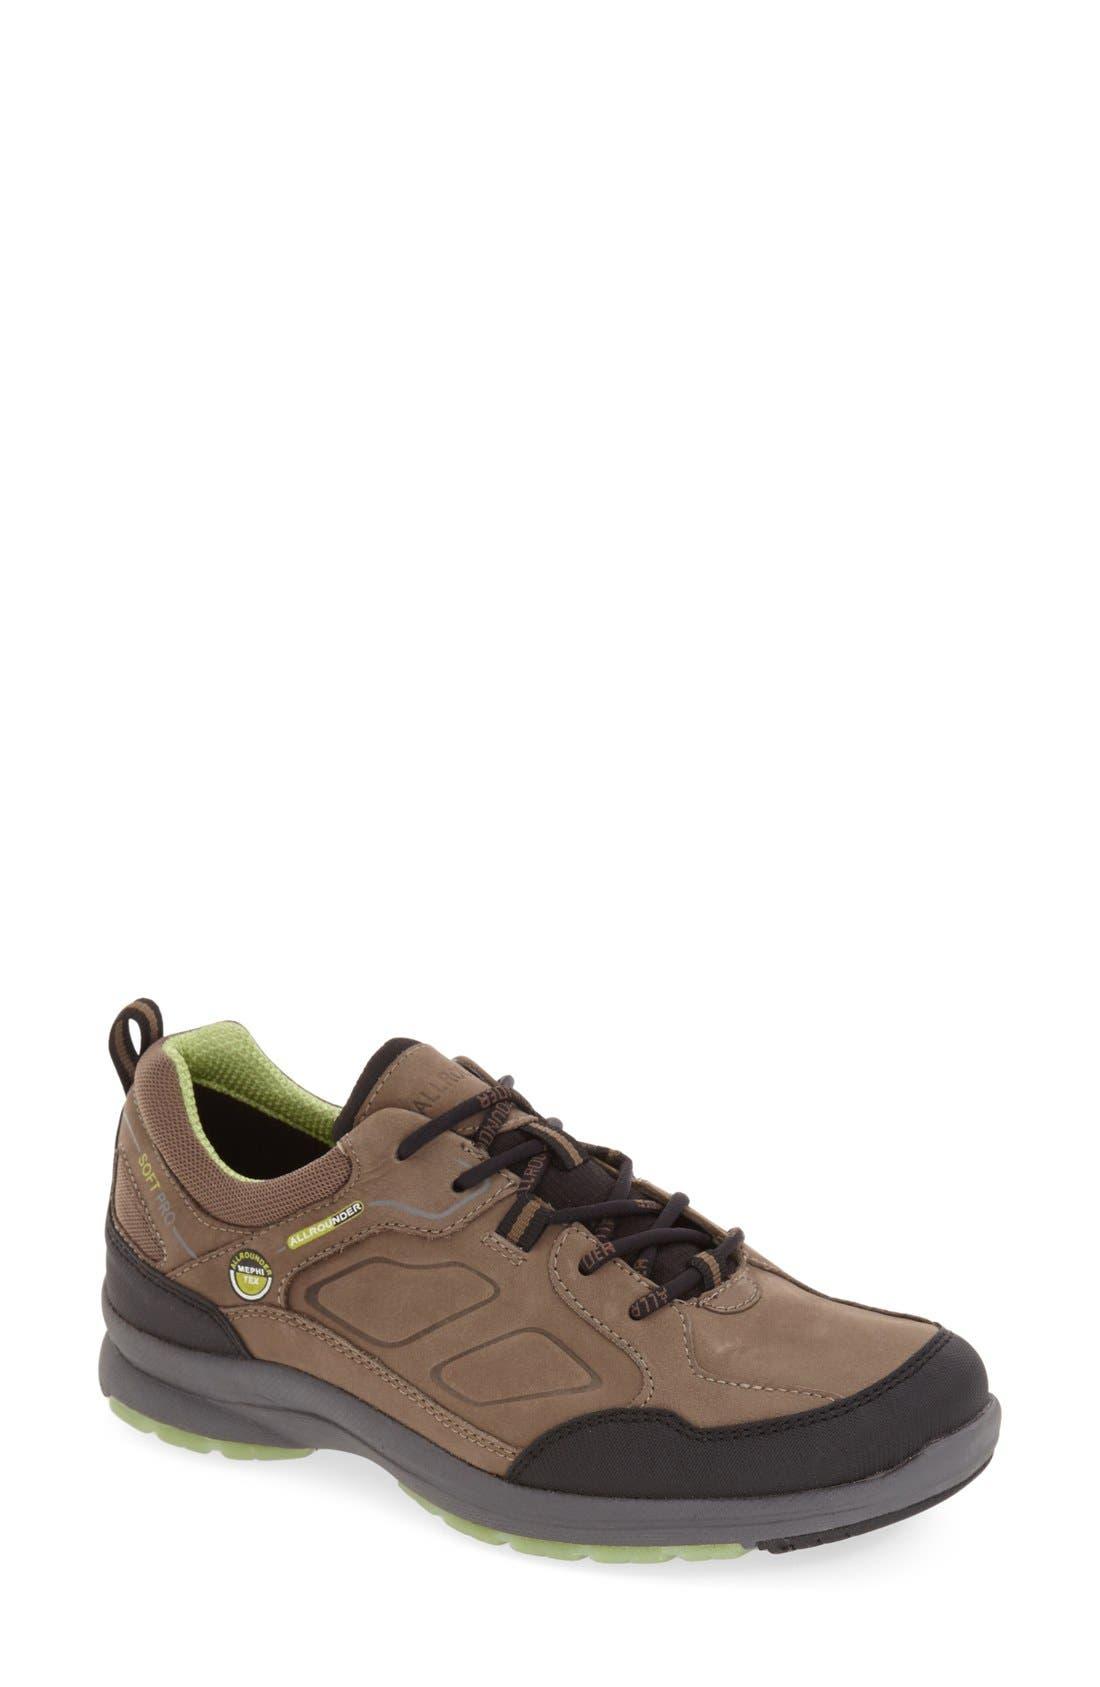 ALLROUNDER BY MEPHISTO 'Dascha Tex' Waterproof Sneaker, Main, color, 057